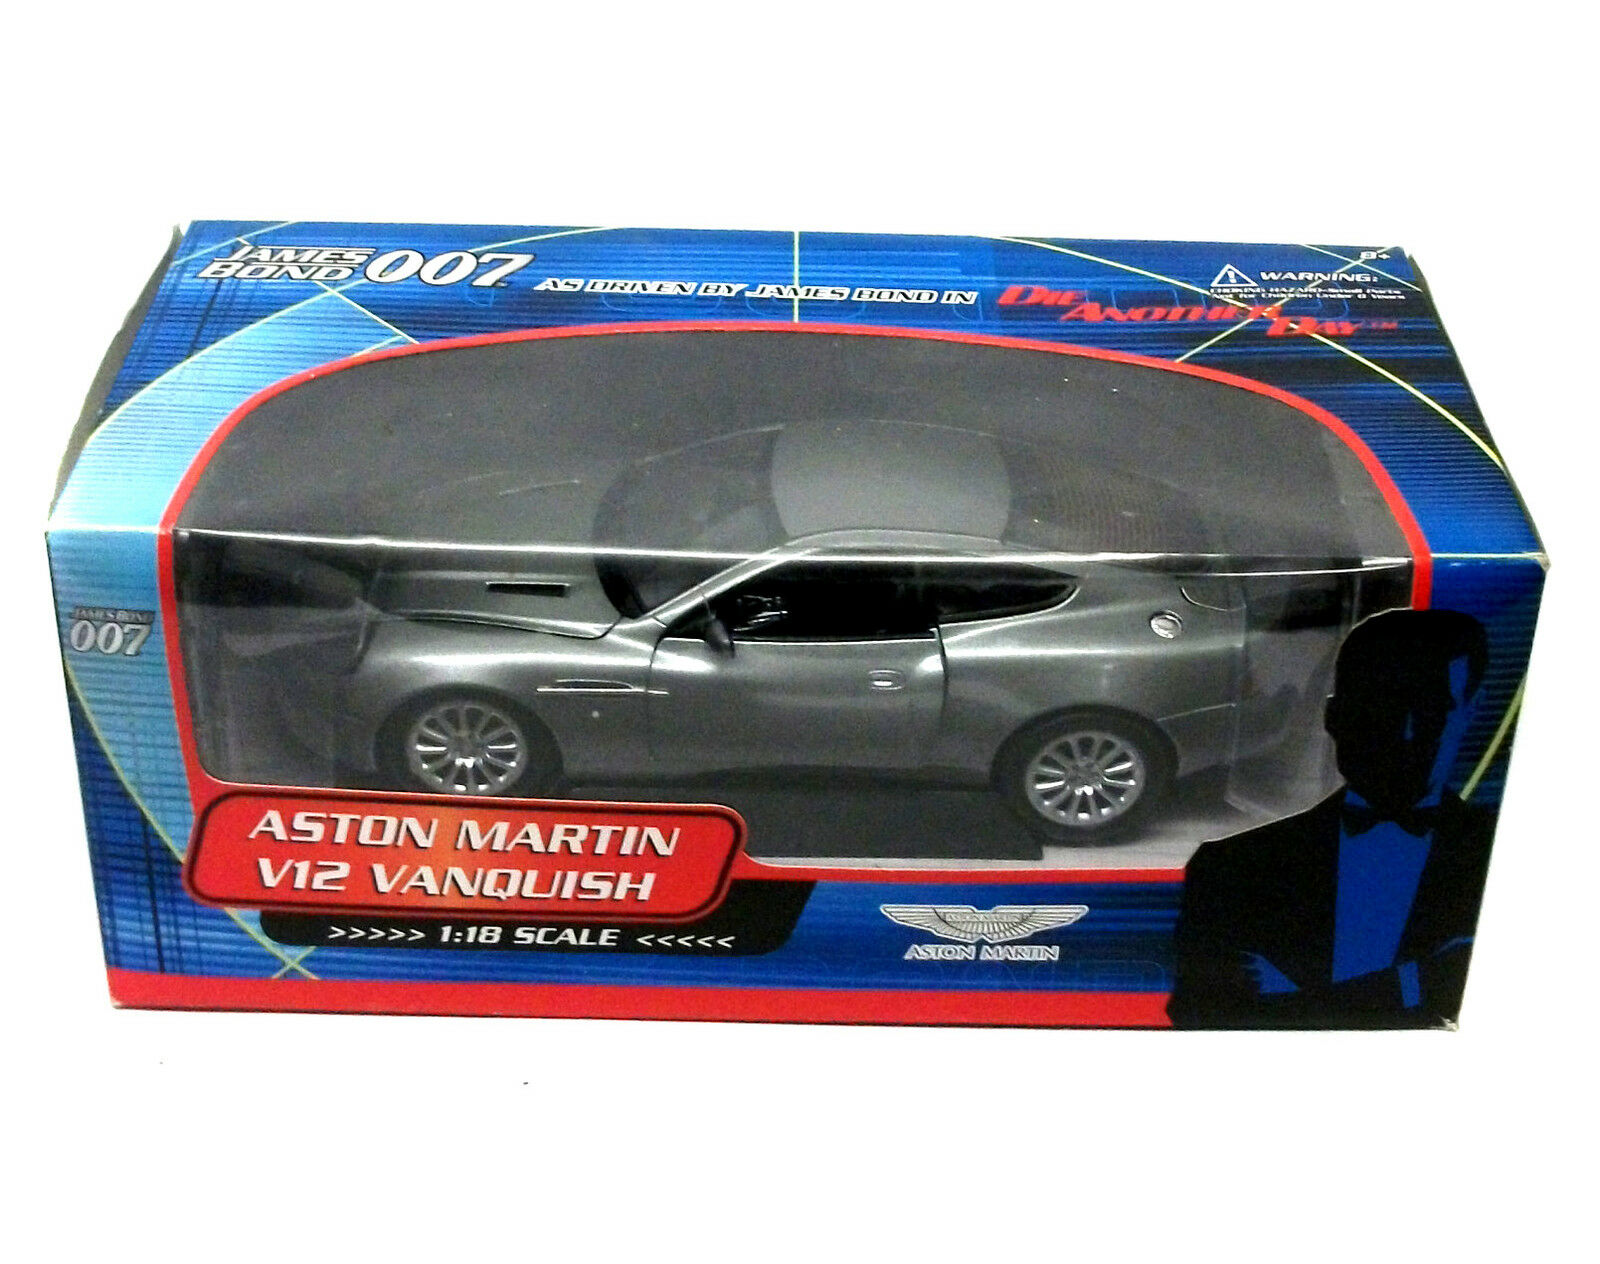 007 JAMES BOND 1 18 Die Cast Movie Car ASTON MARTIN V12 VANQUISH